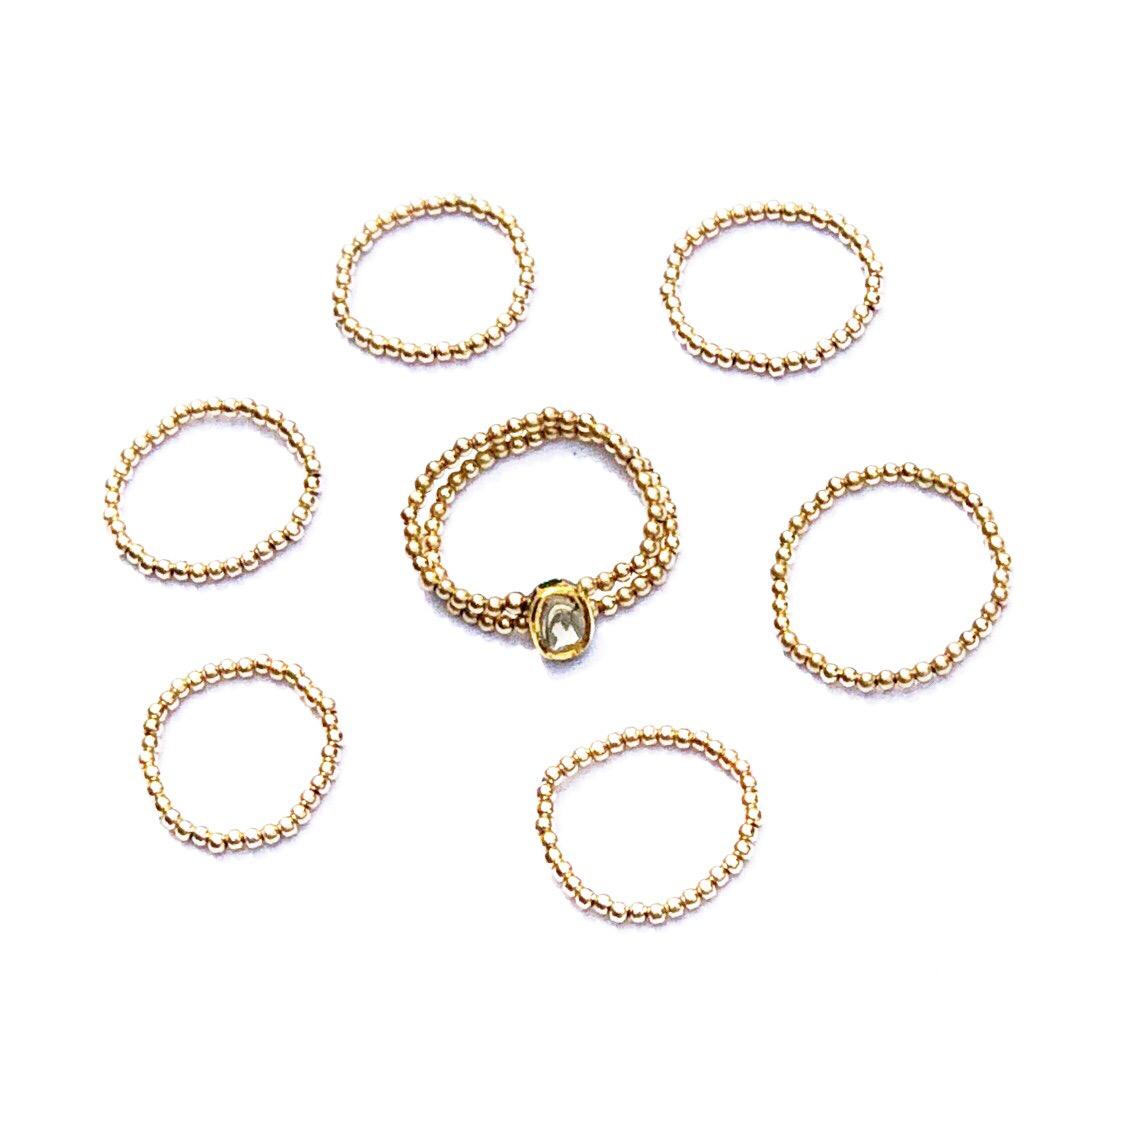 Indy & Noa rosecut Diamond ring